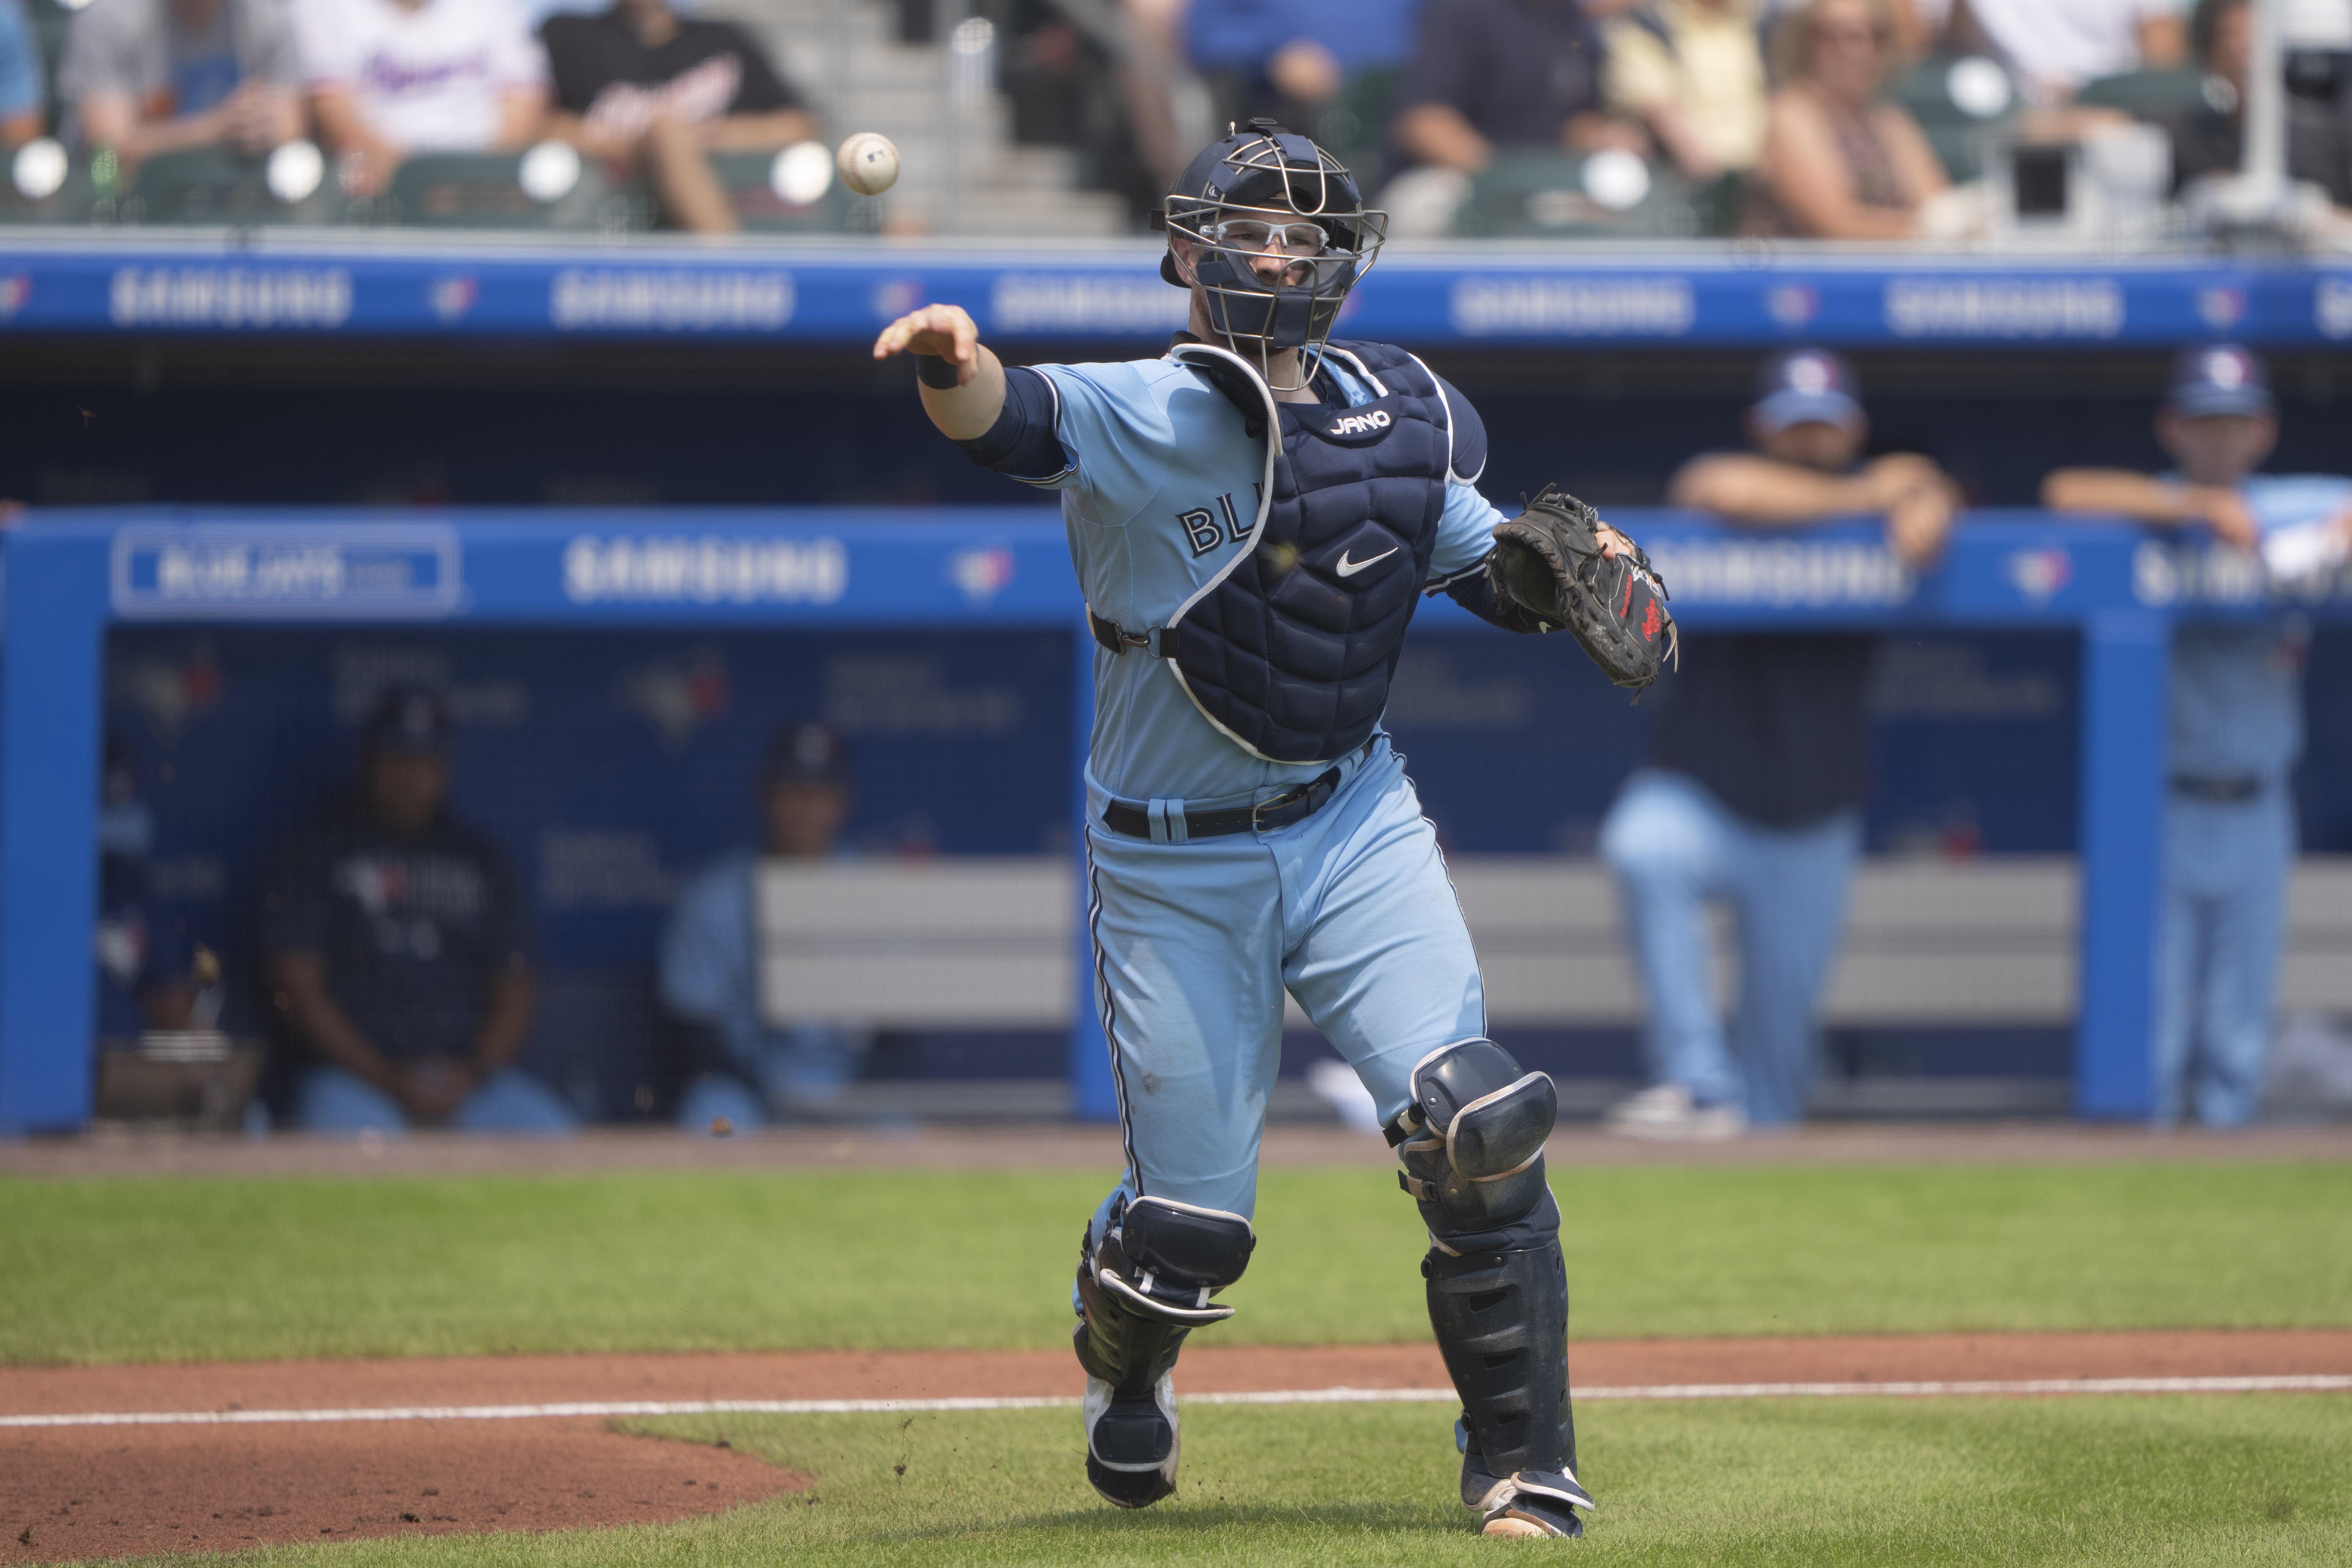 MLB: Game 1 - Texas Rangers at Toronto Blue Jays